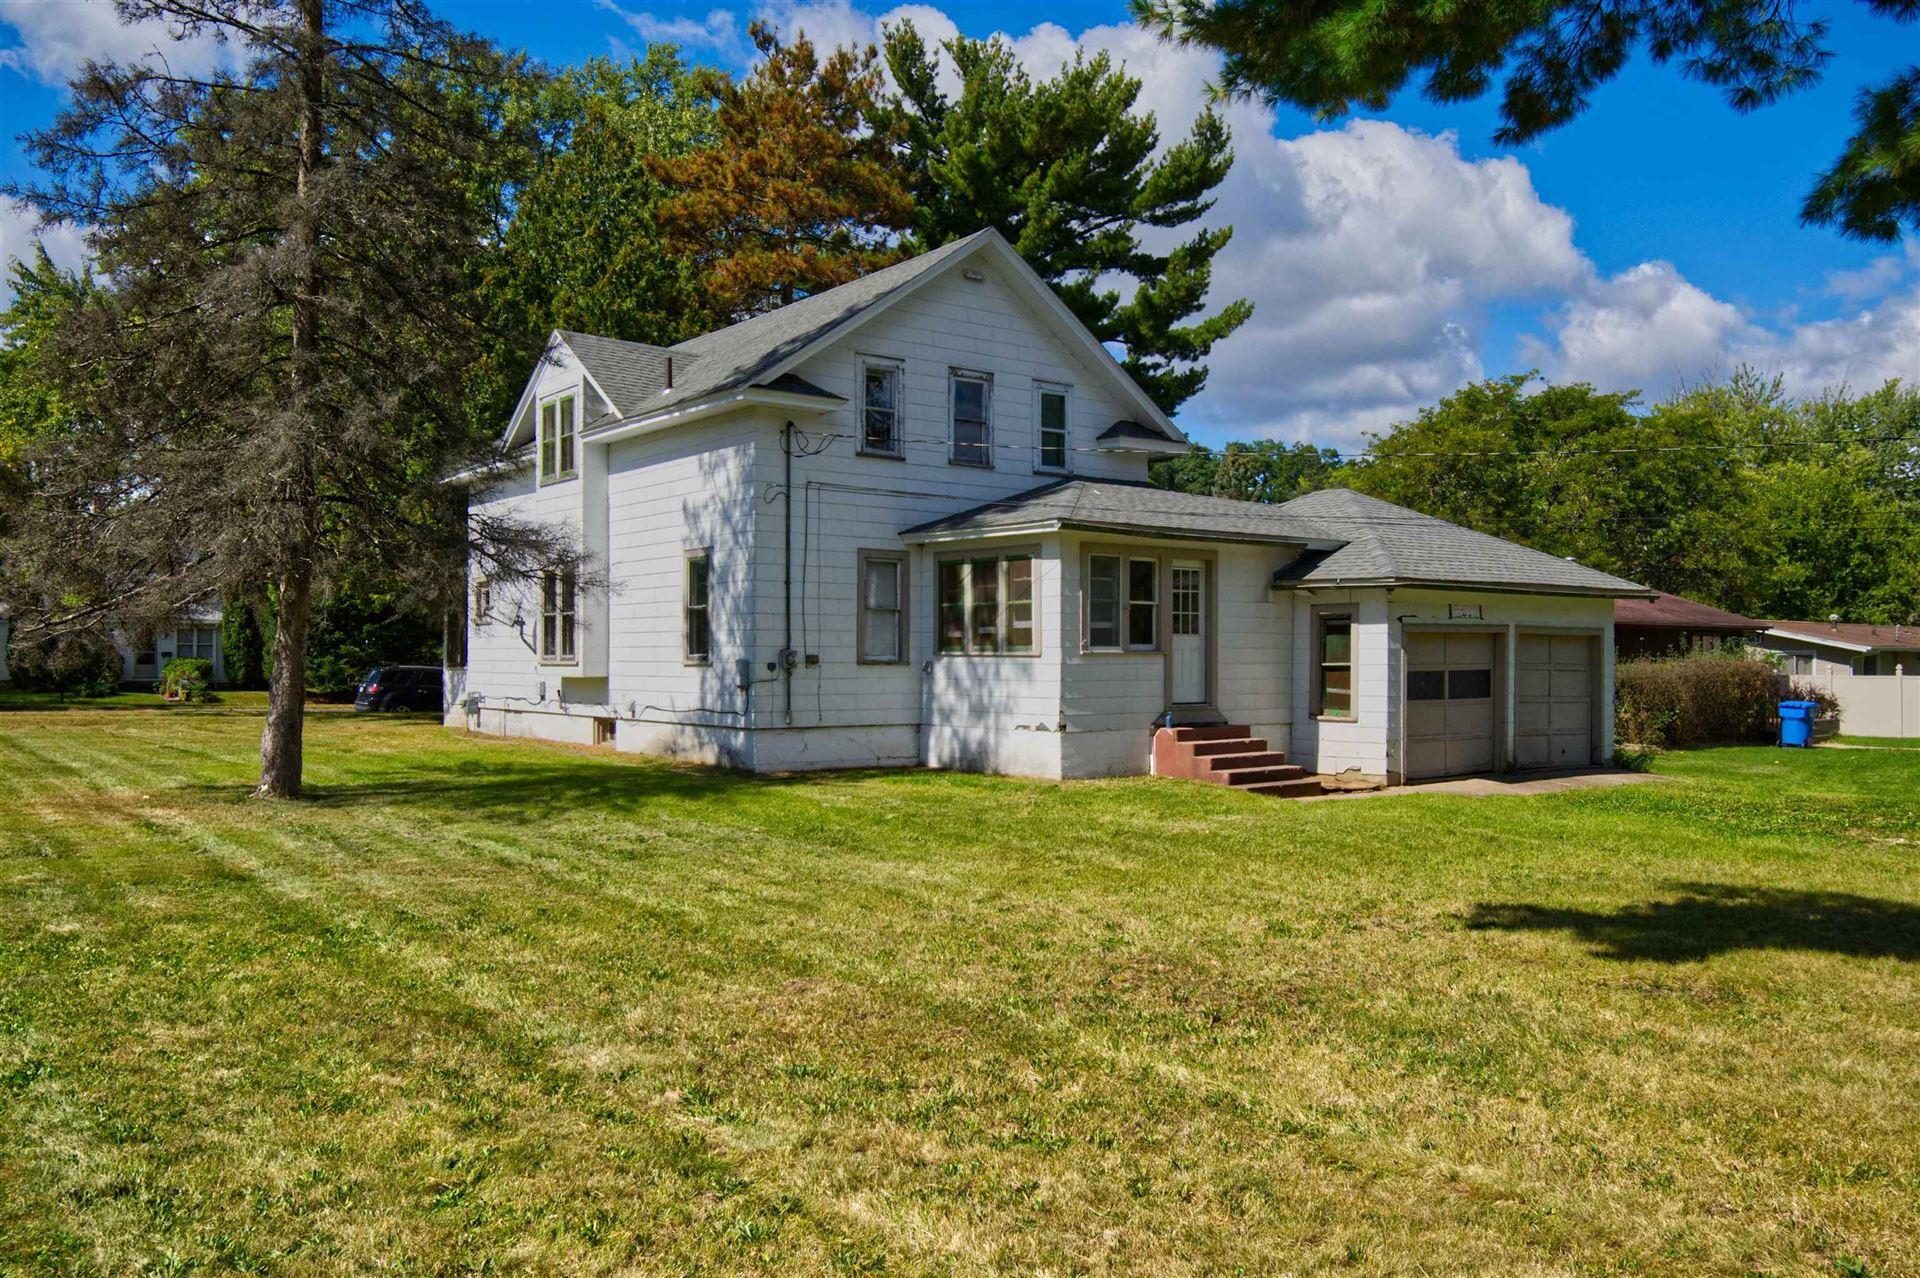 1104 Vine St, Wisconsin Dells, WI 53965 - #: 1920344